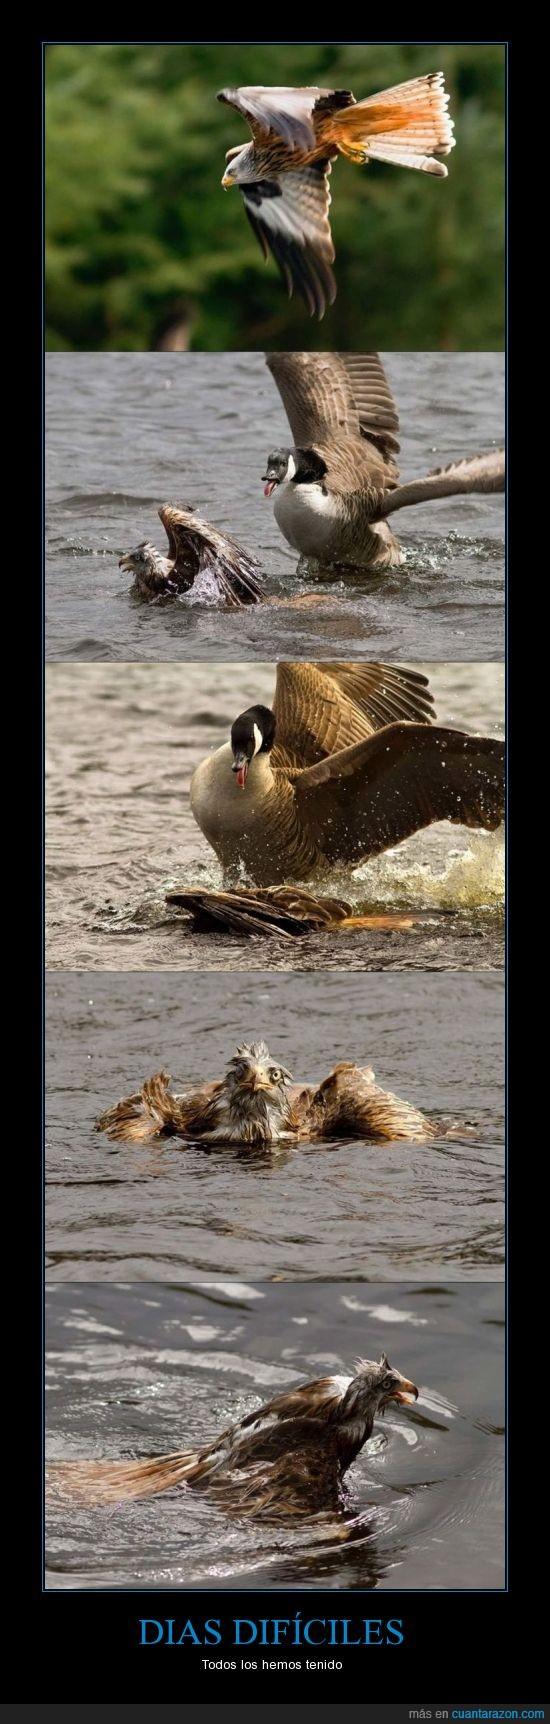 agua,aguila,atacar,lago,pato,pelea,perder,tontisima...